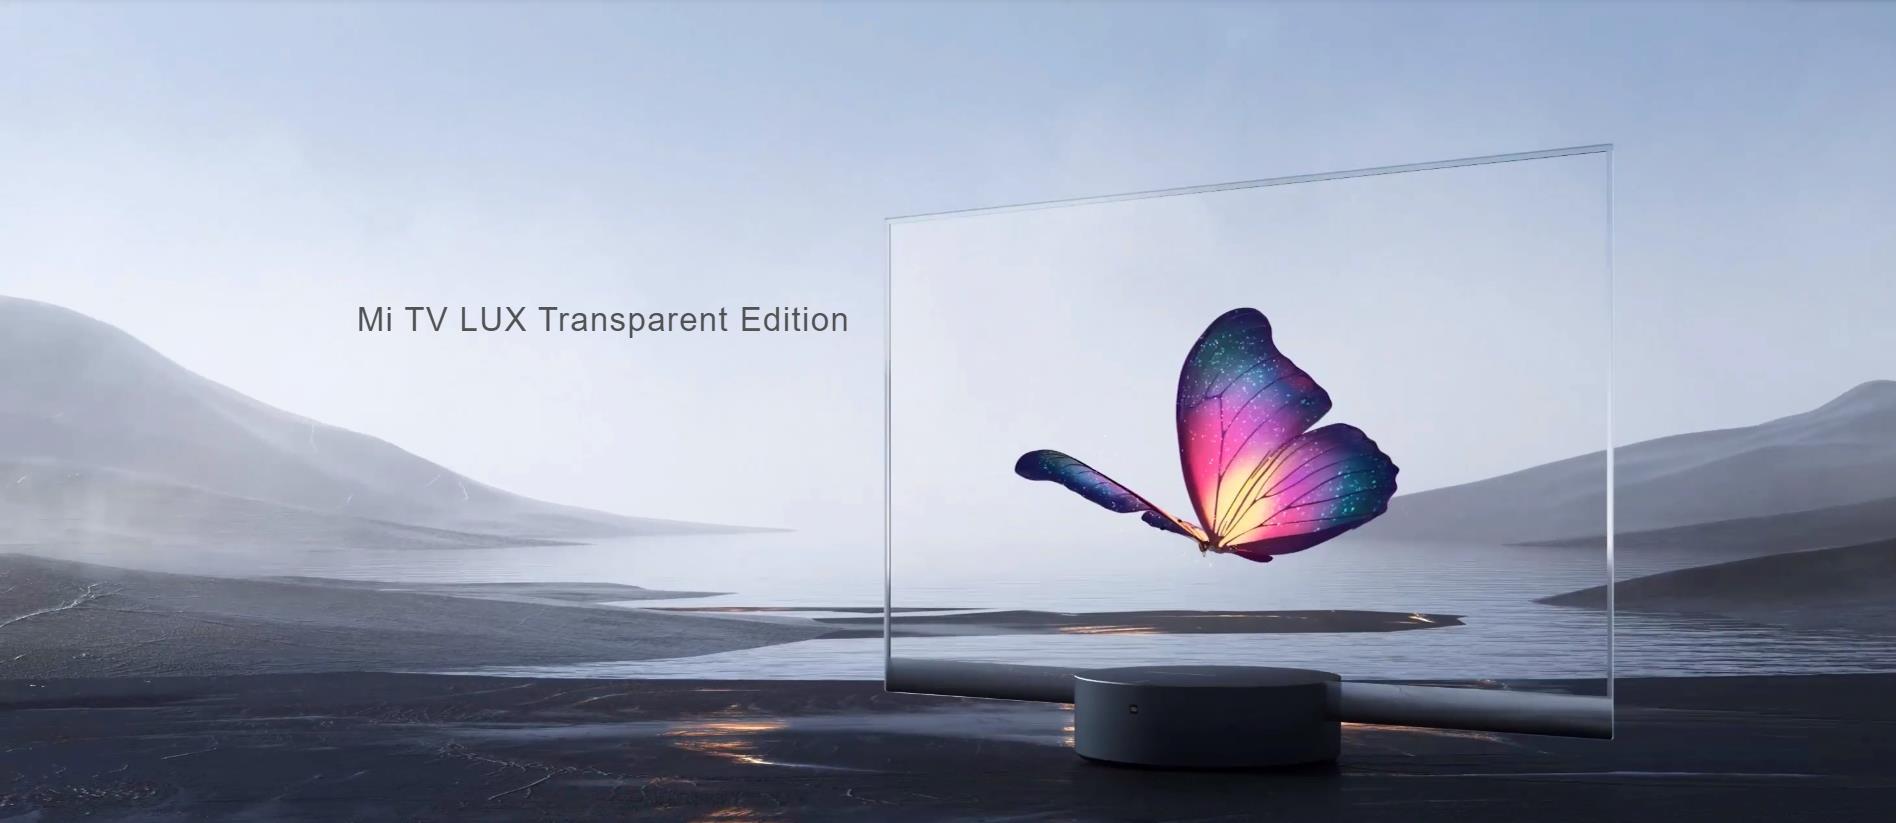 Mi Tv Lux Transparent Edition5